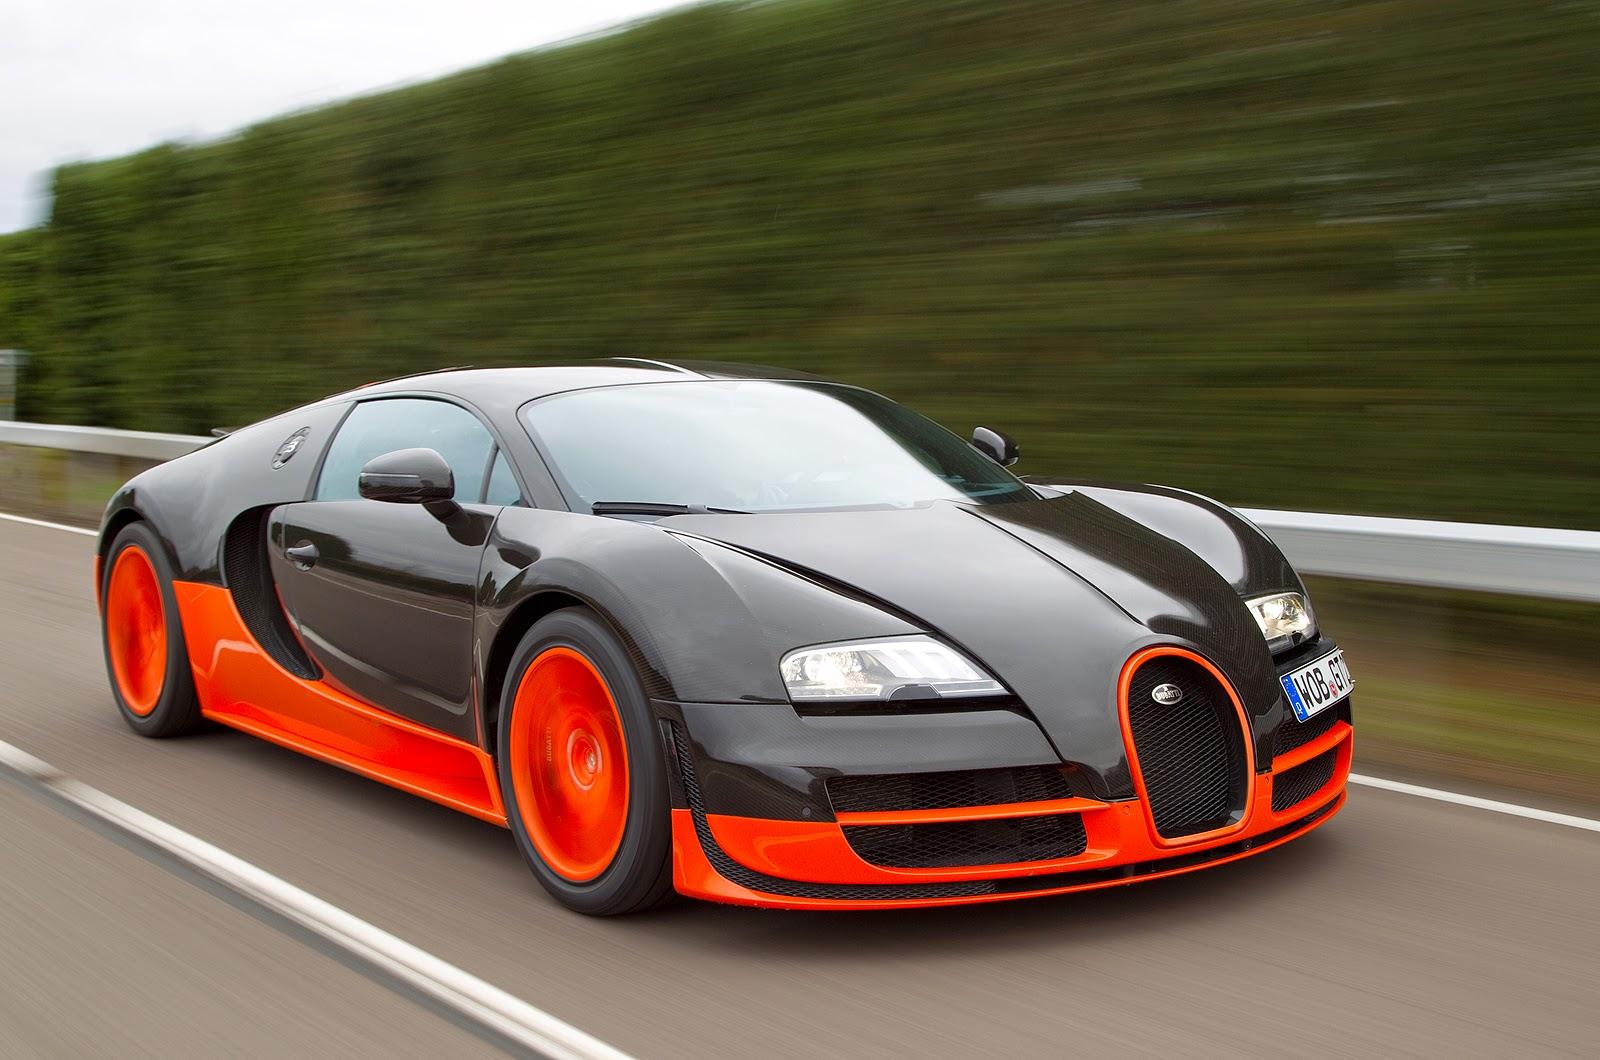 Fastest Car In The World 2015 >> Fastest Cars Bugatti Veyron2015 Fastest Cars In The World 2015